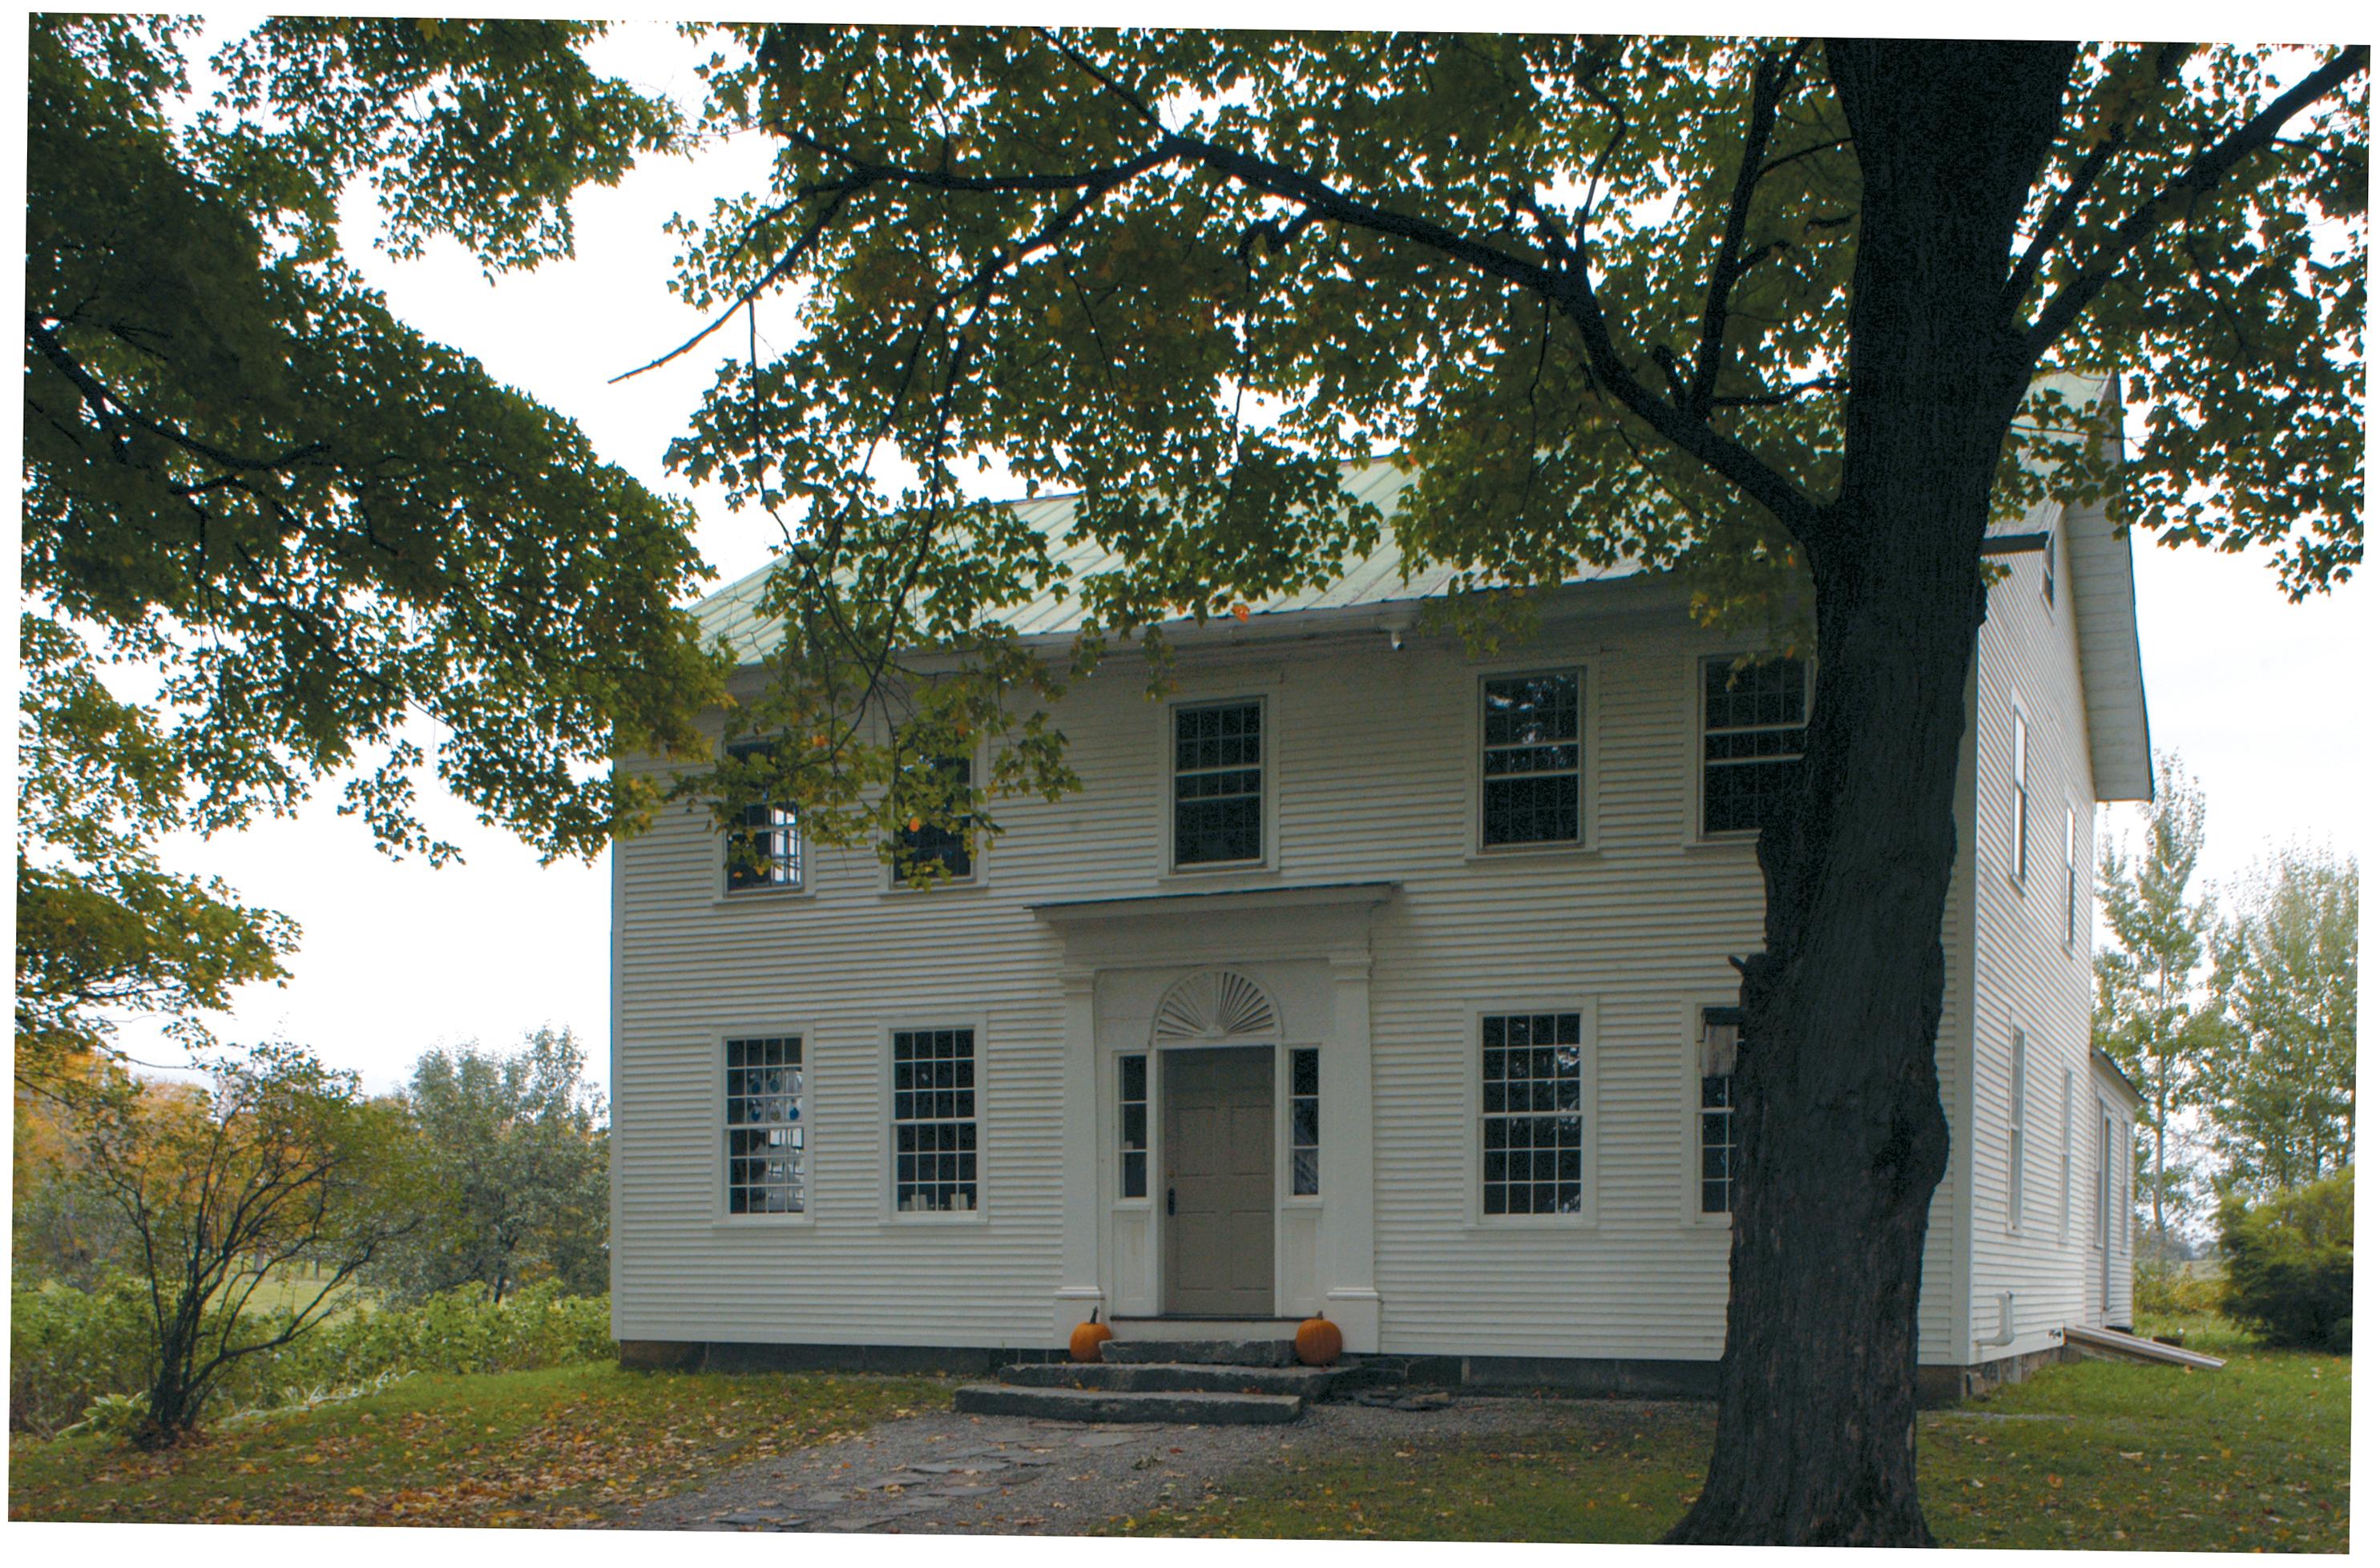 Alexander Twighlight House, Brownington